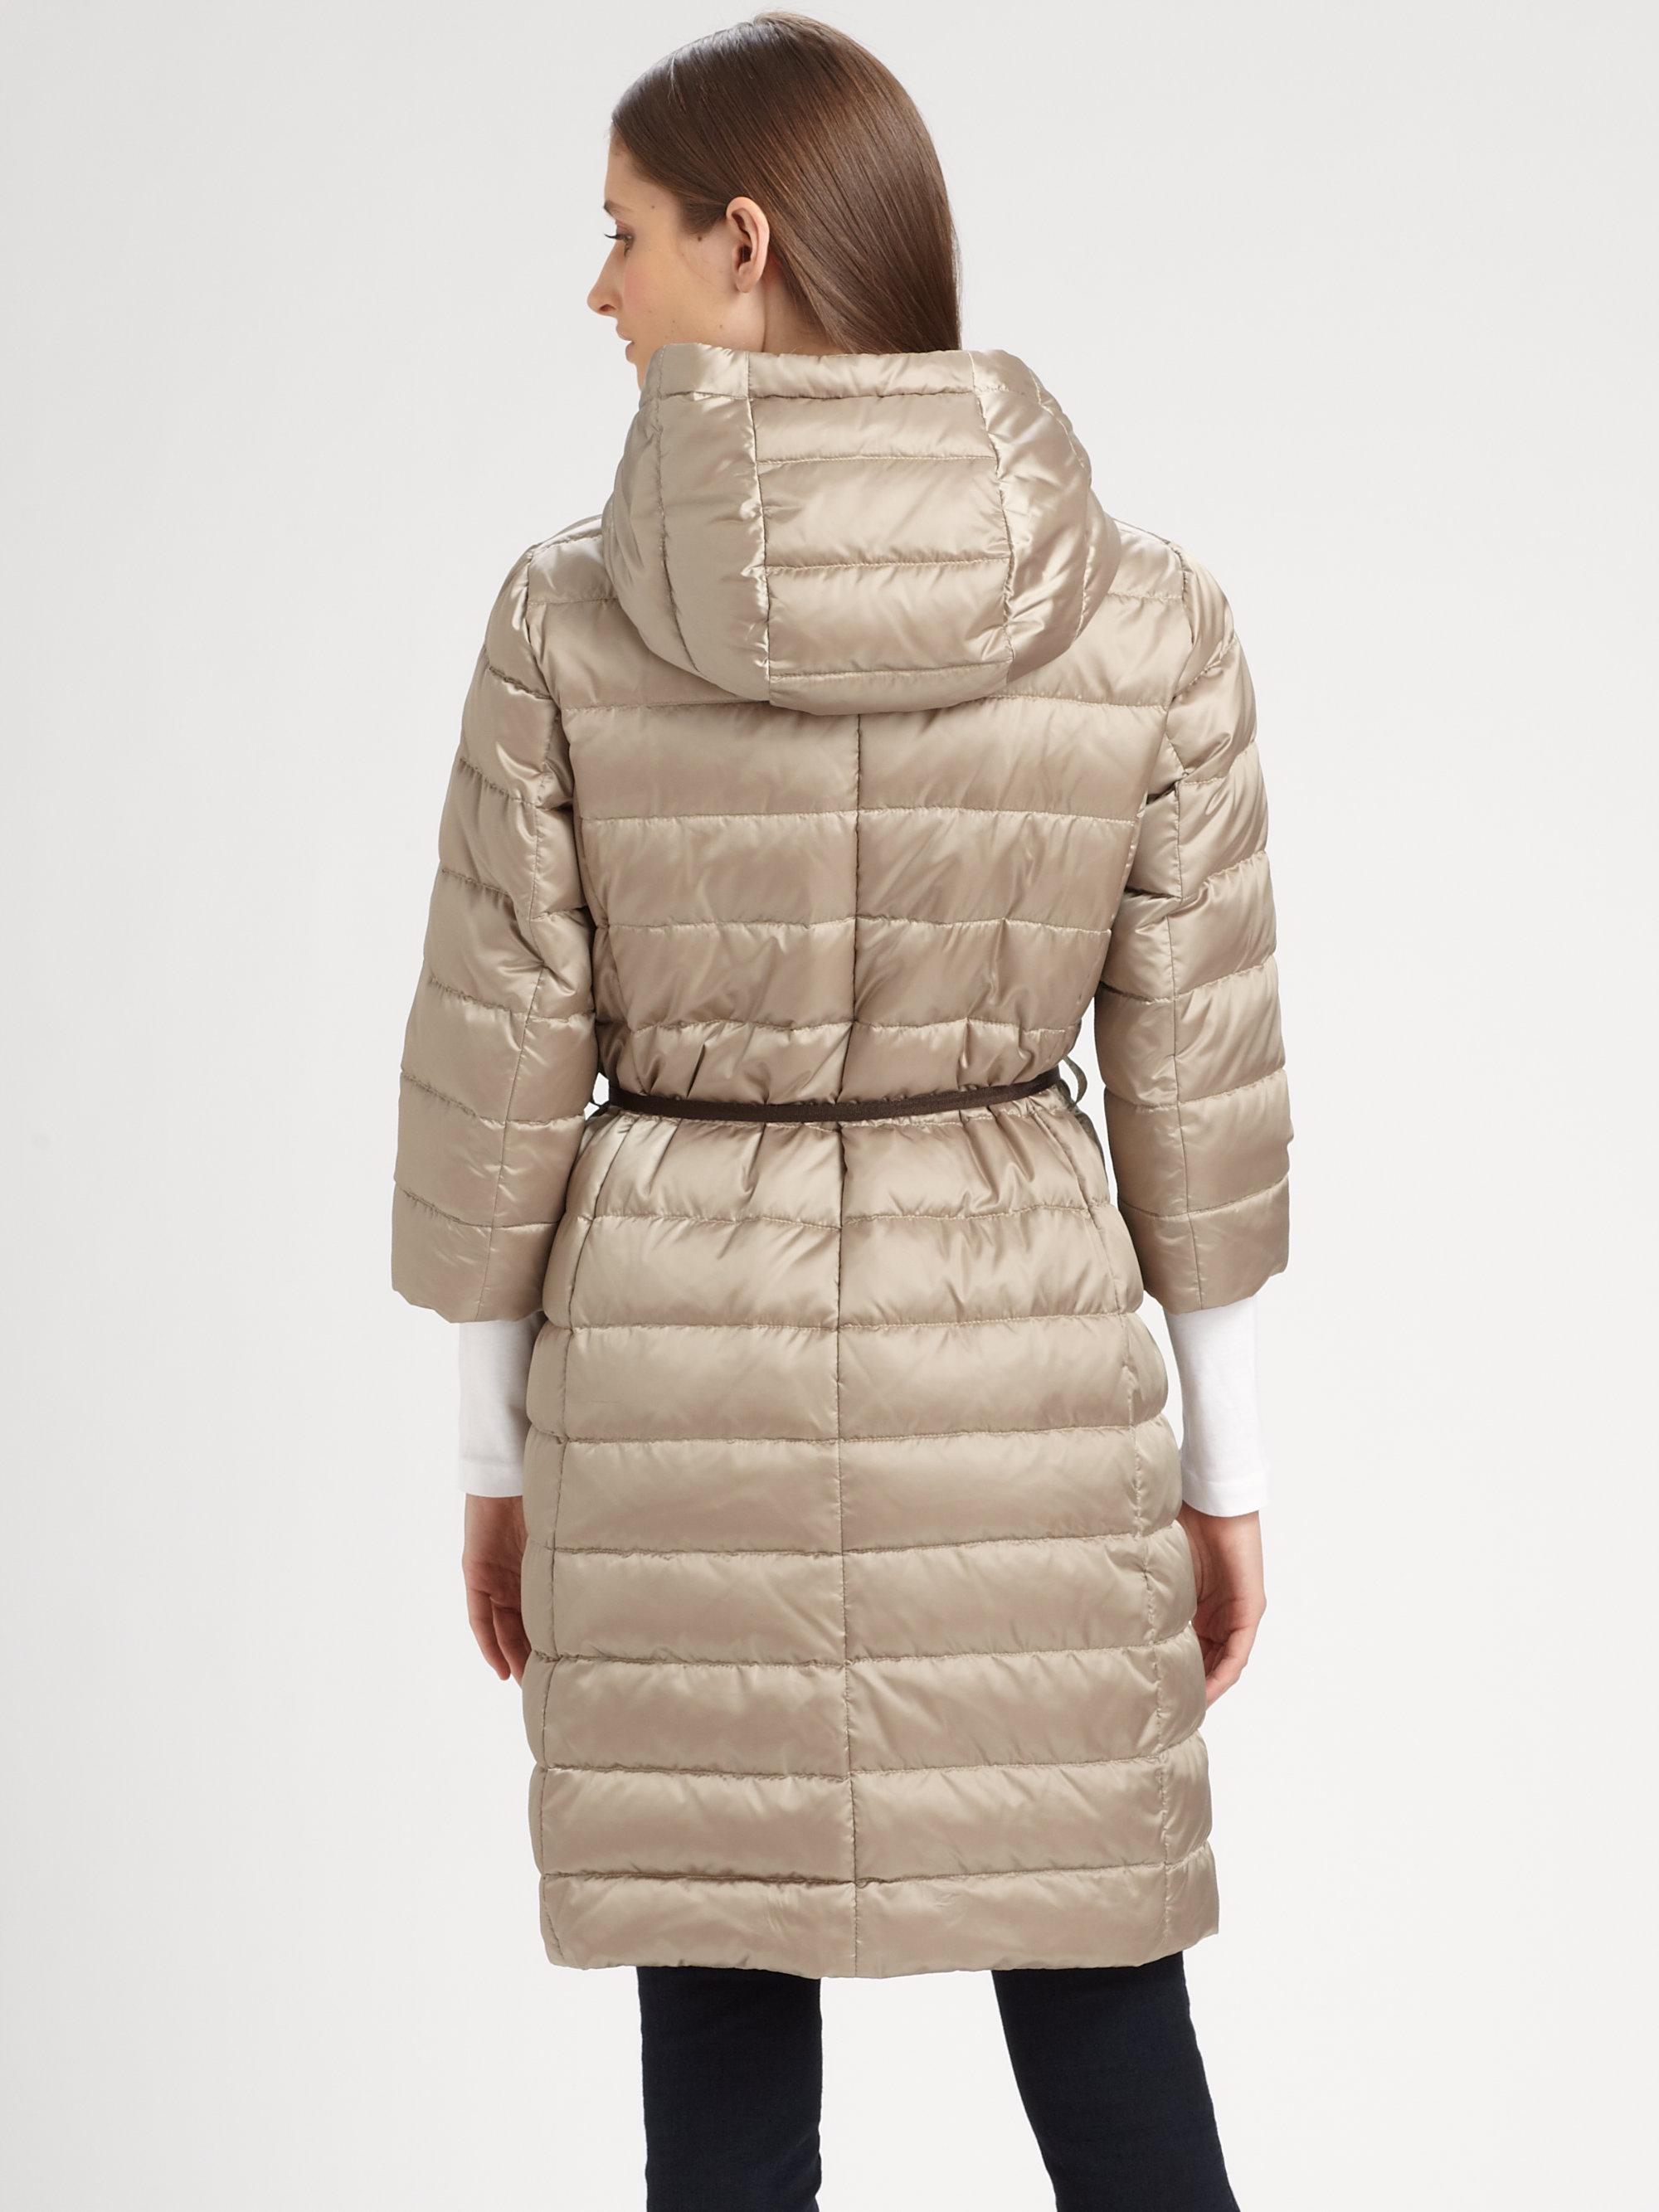 Lyst - Max mara Novef Long Quilted Coat in Natural : max mara quilted jacket - Adamdwight.com